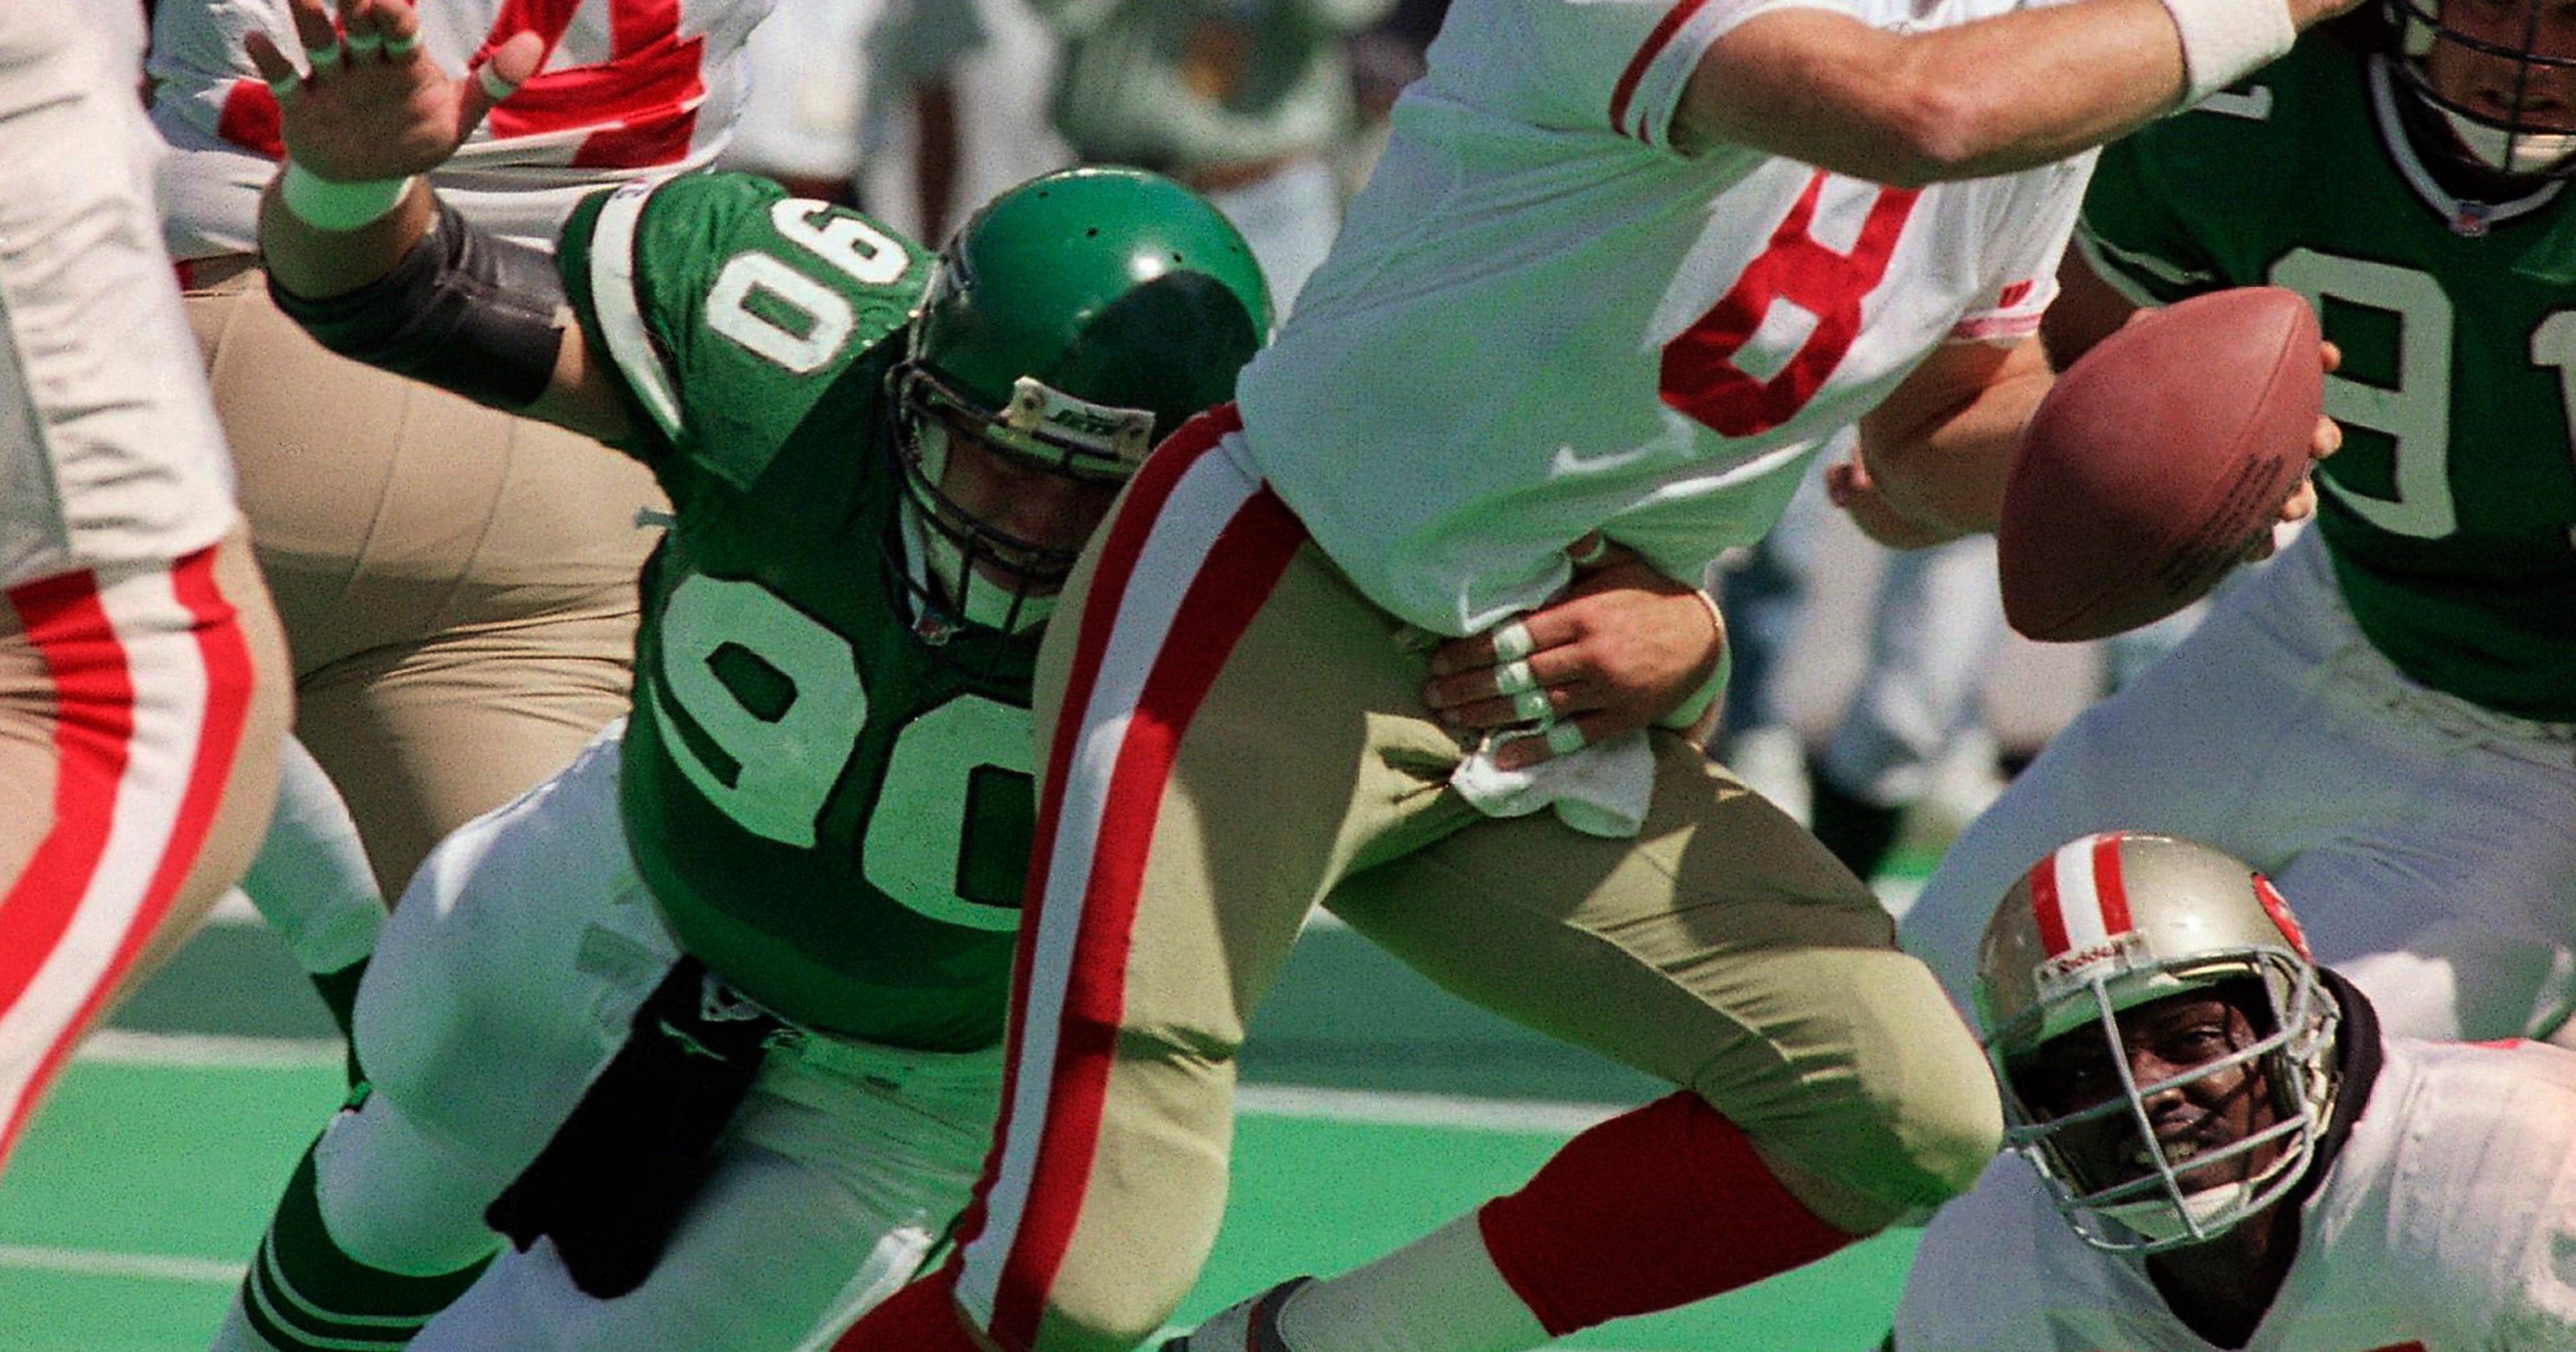 41b2bf847f8 Former NFL player Dennis Byrd killed in car accident